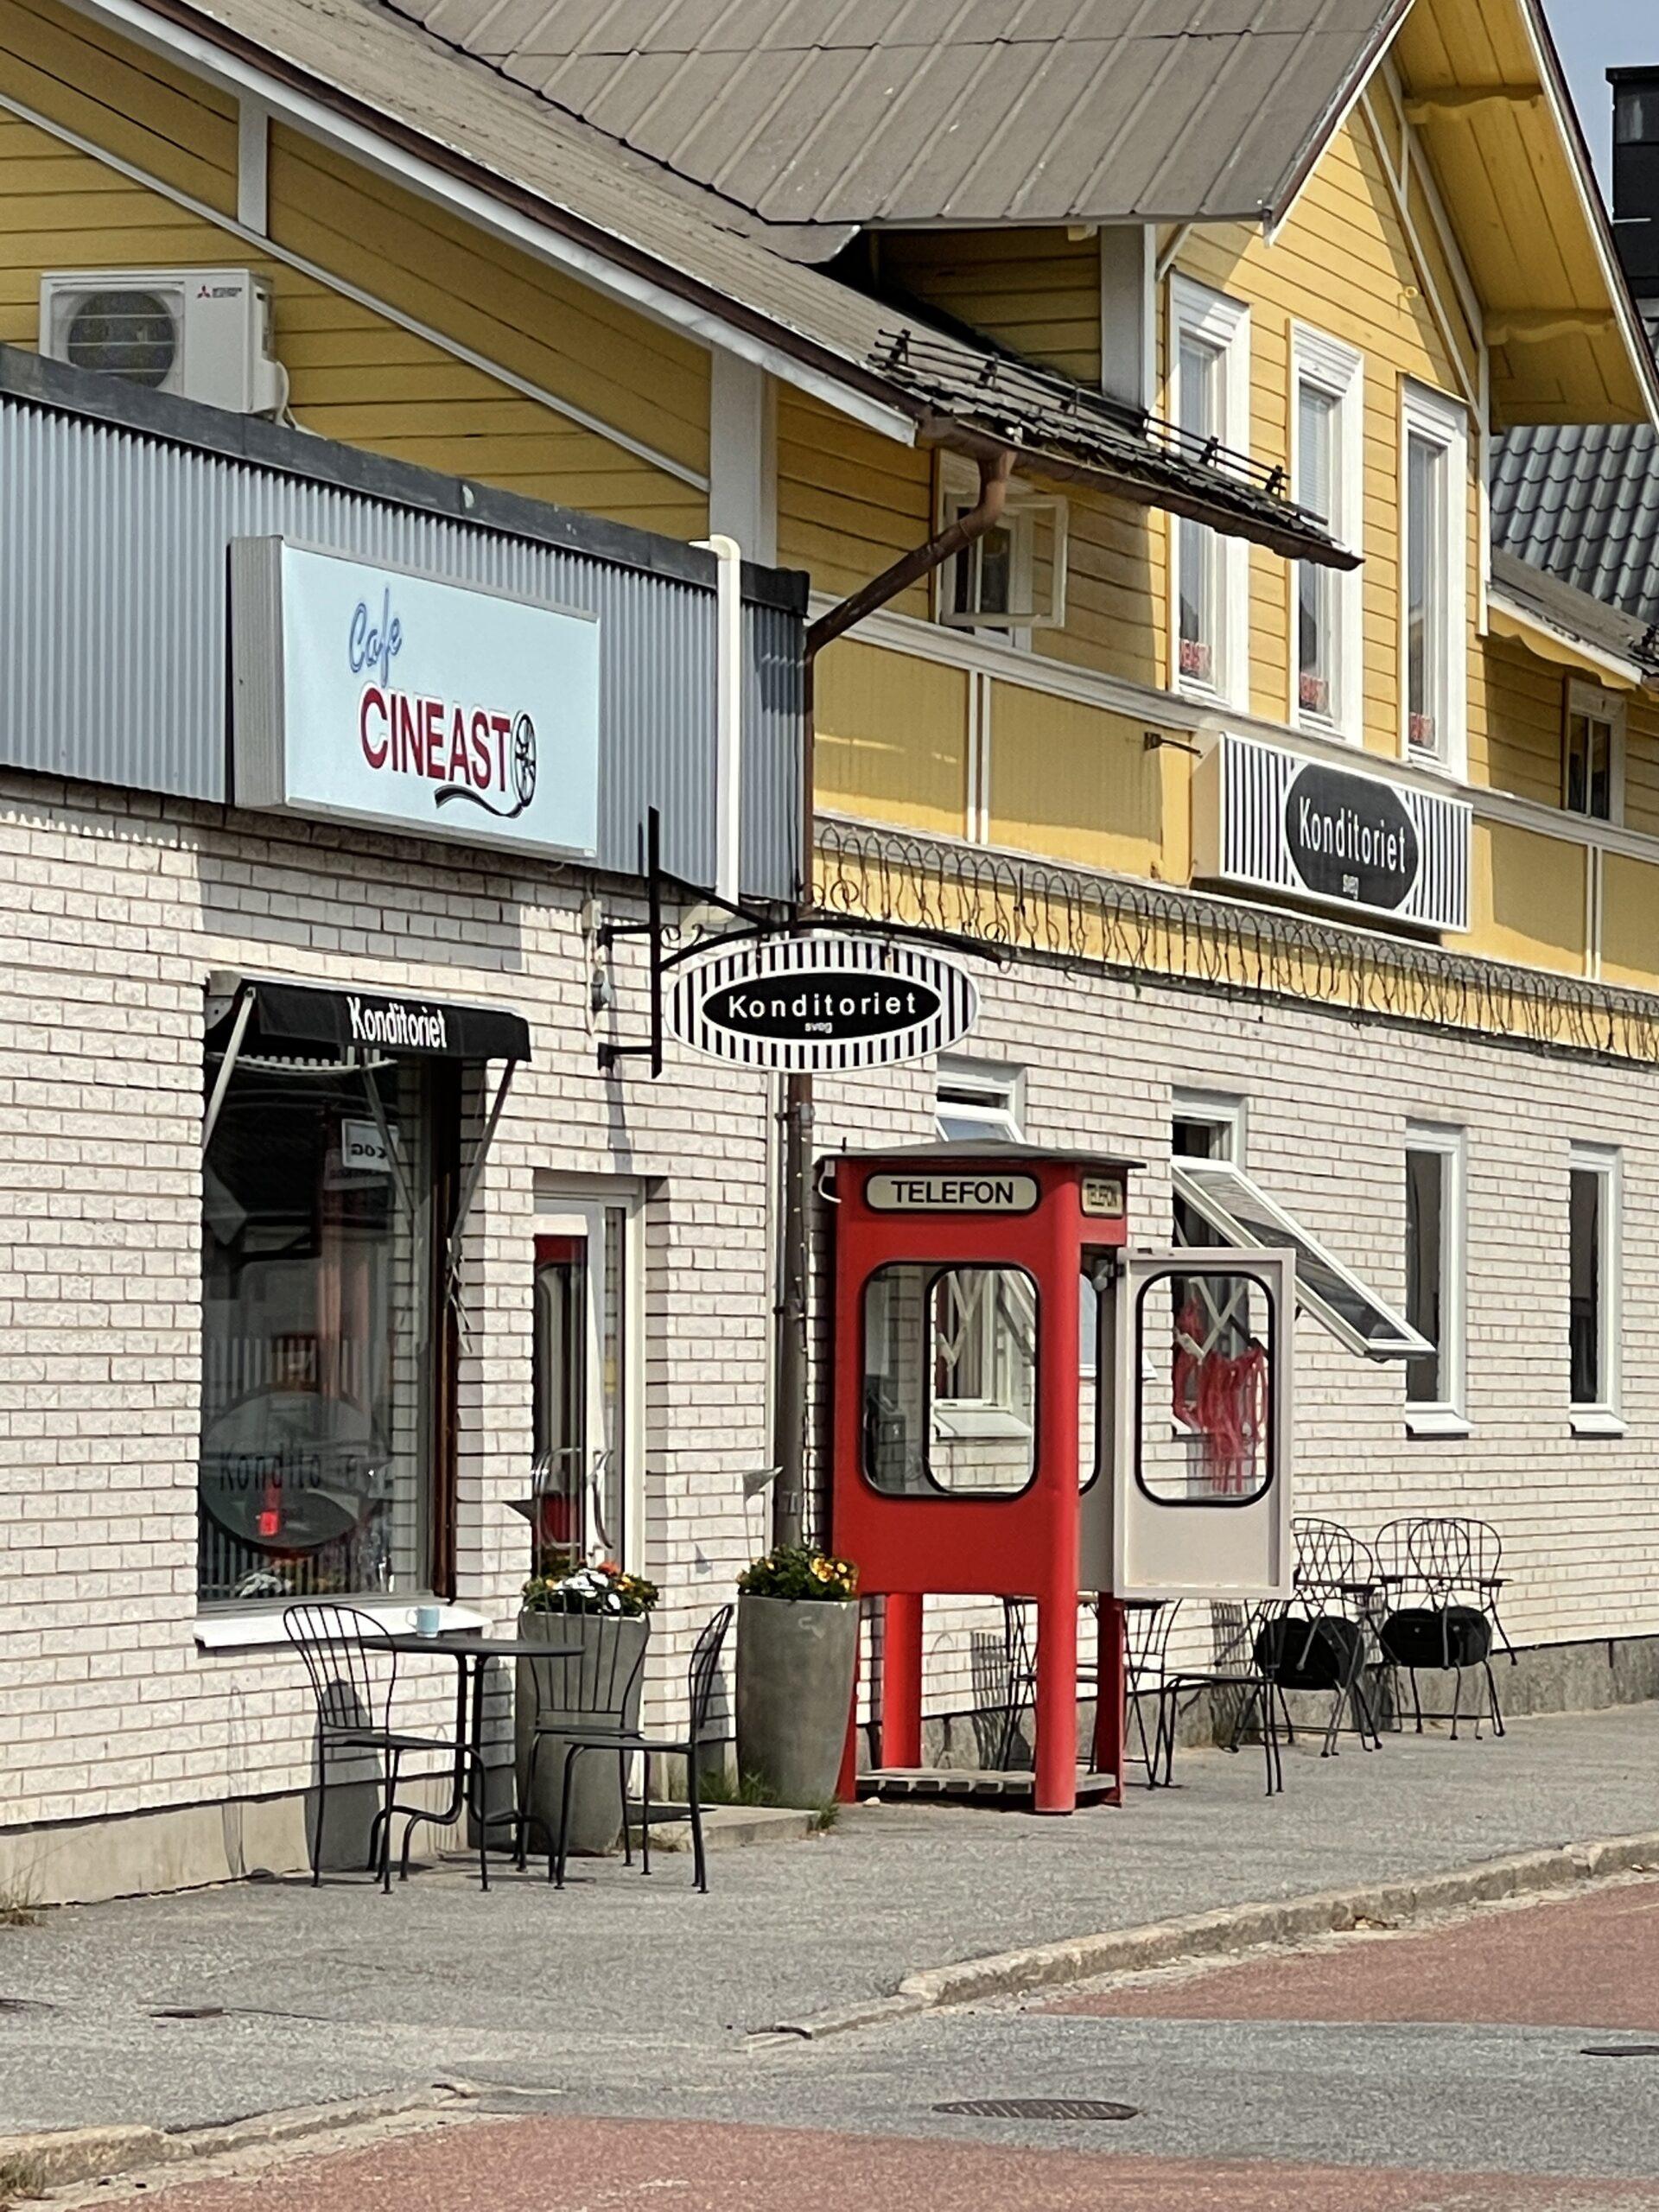 Cafe Cineast i Sveg